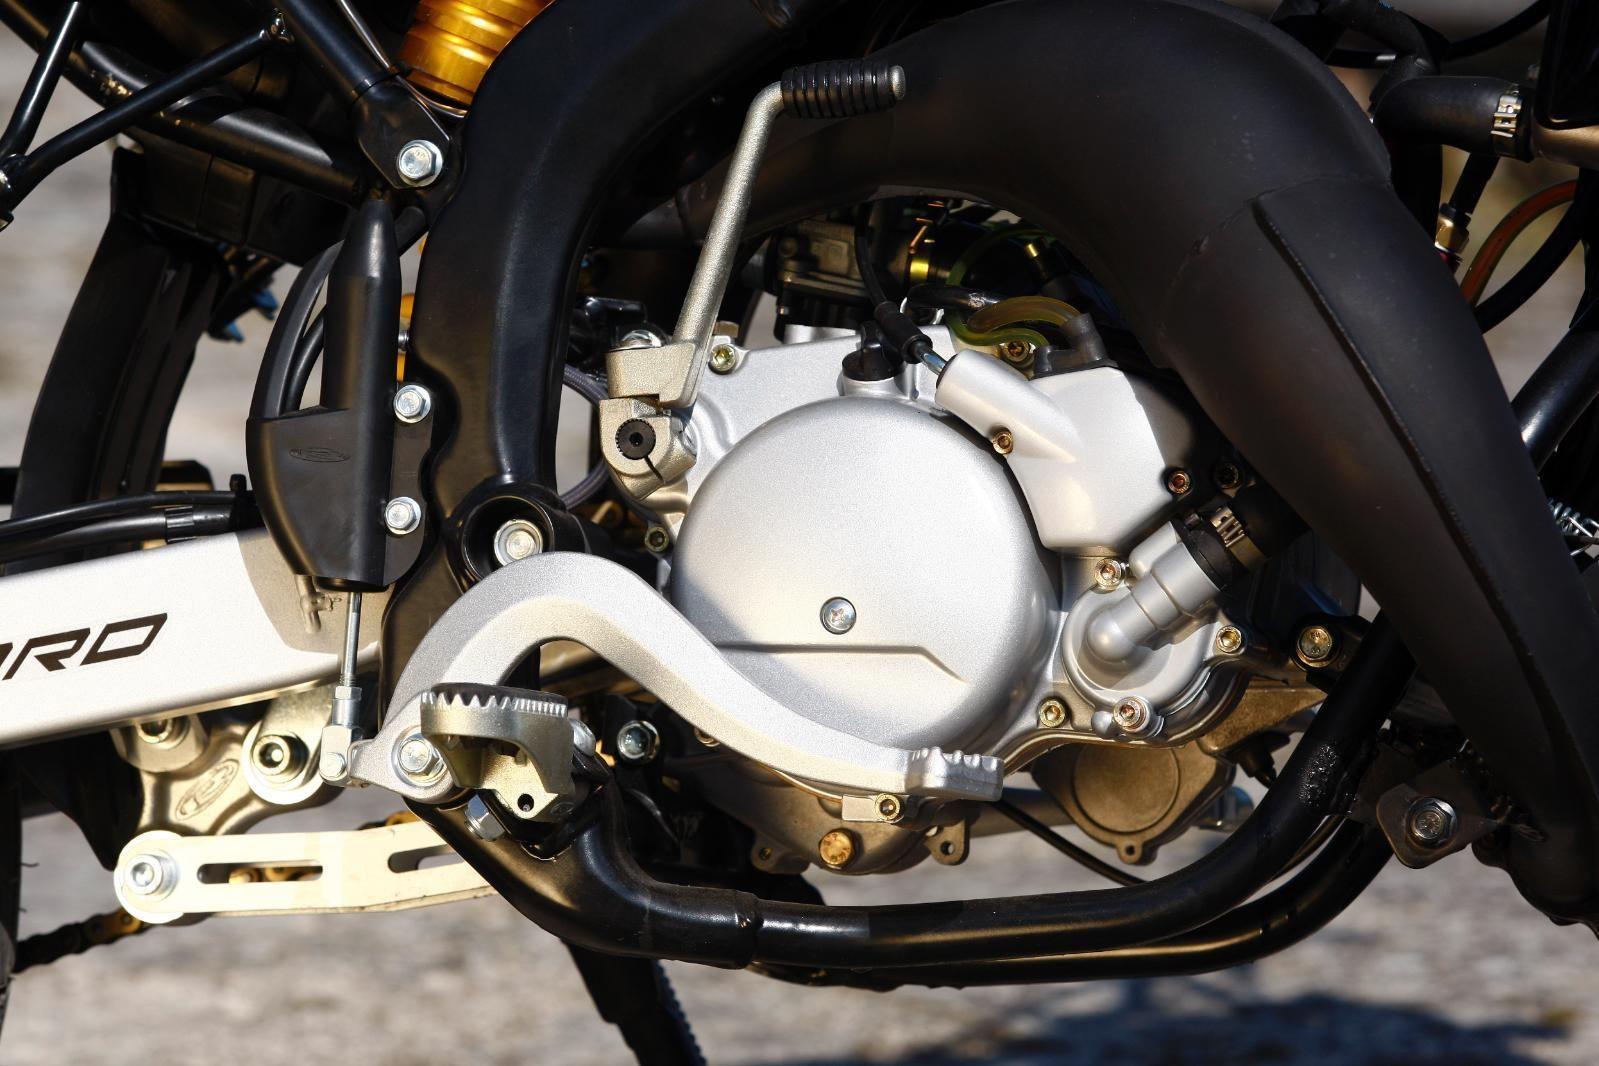 rieju mrt pro supermotard 50cc moto cross. Black Bedroom Furniture Sets. Home Design Ideas